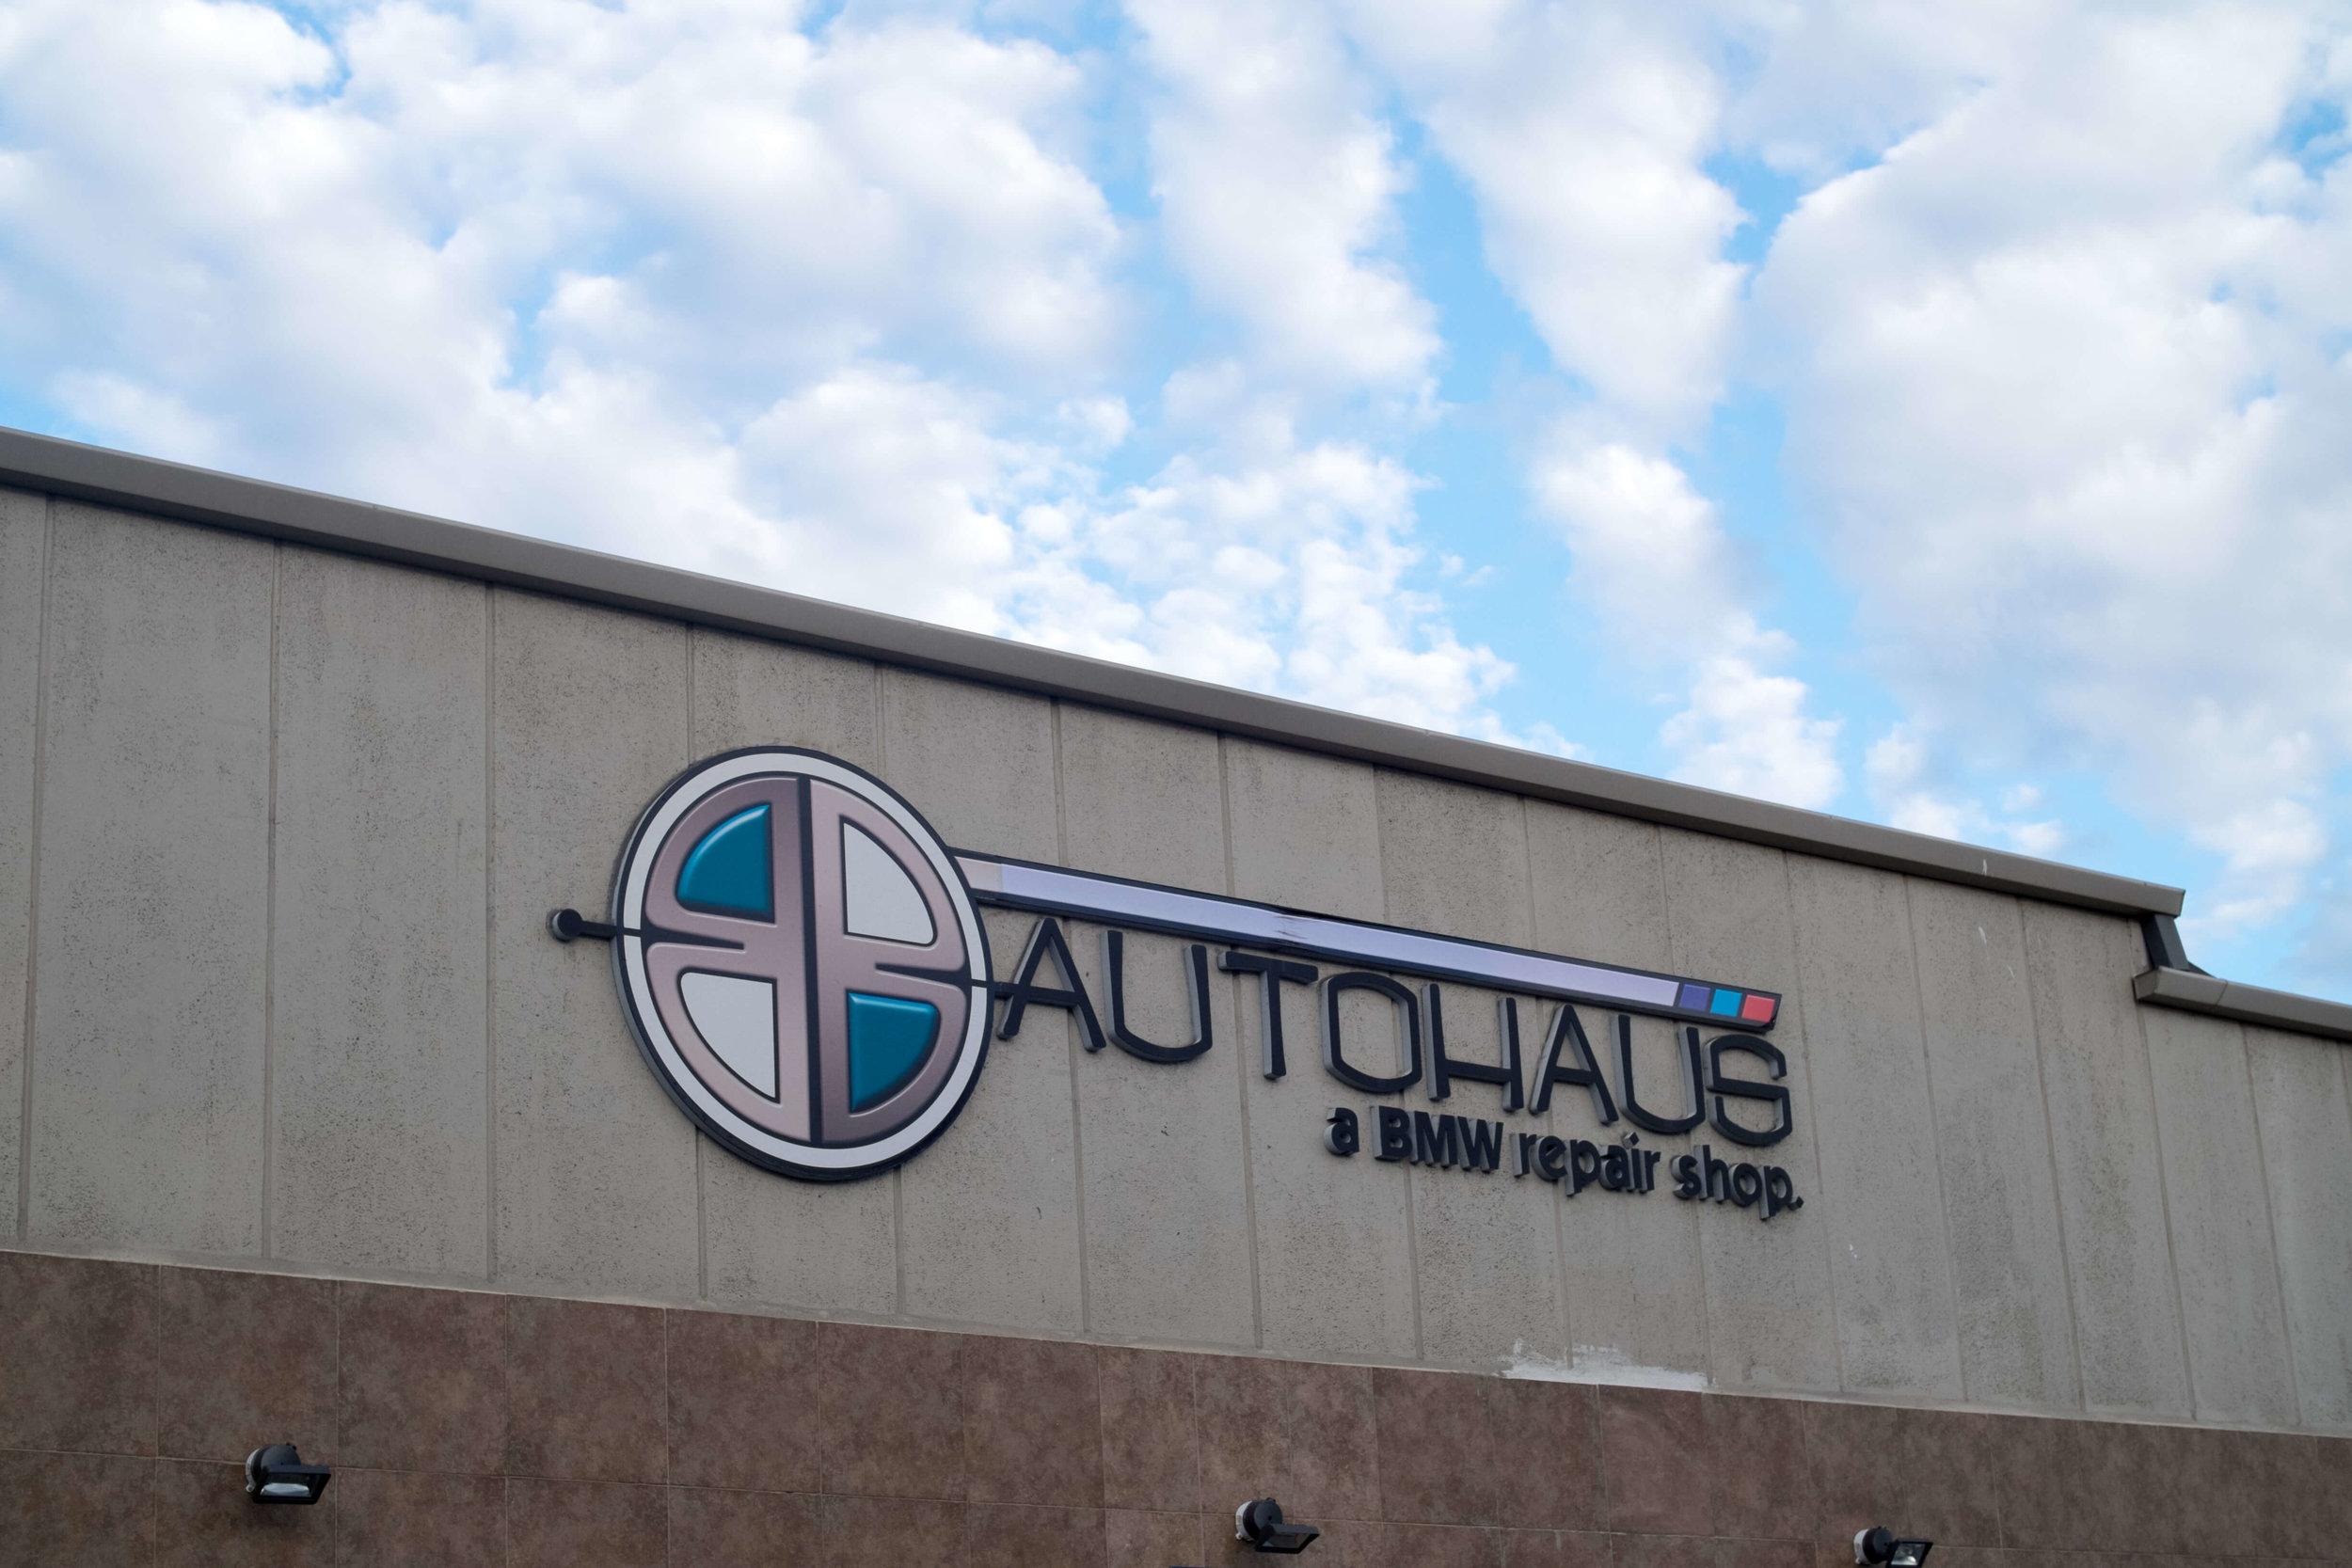 B and B Autohaus San Diego BMW repair shop